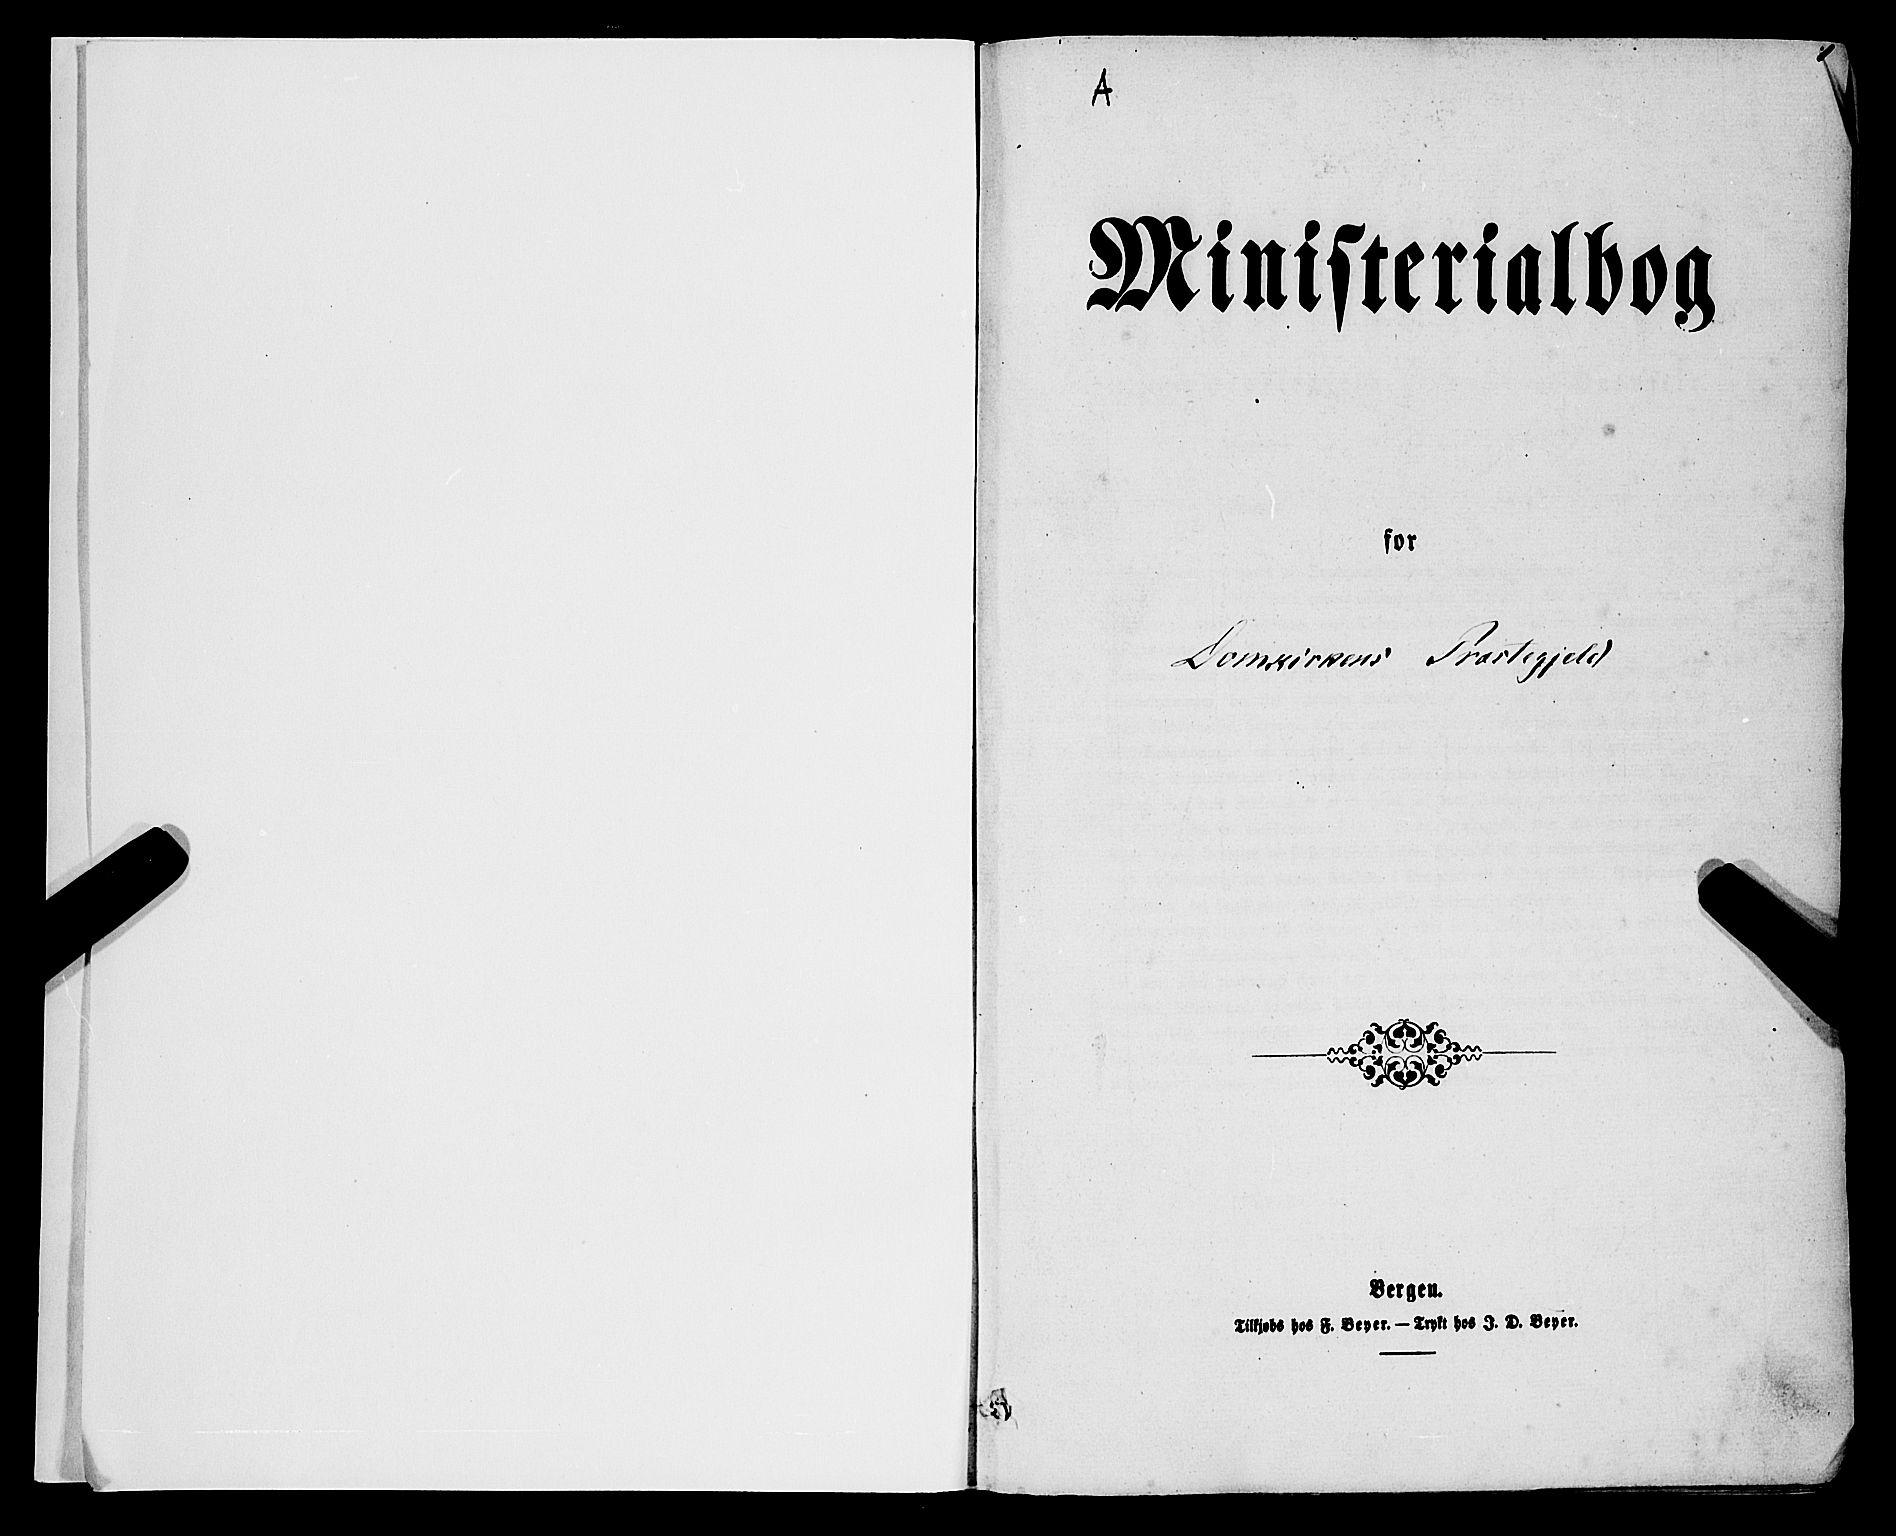 SAB, Domkirken sokneprestembete, H/Haa/L0021: Ministerialbok nr. B 4, 1859-1871, s. 1